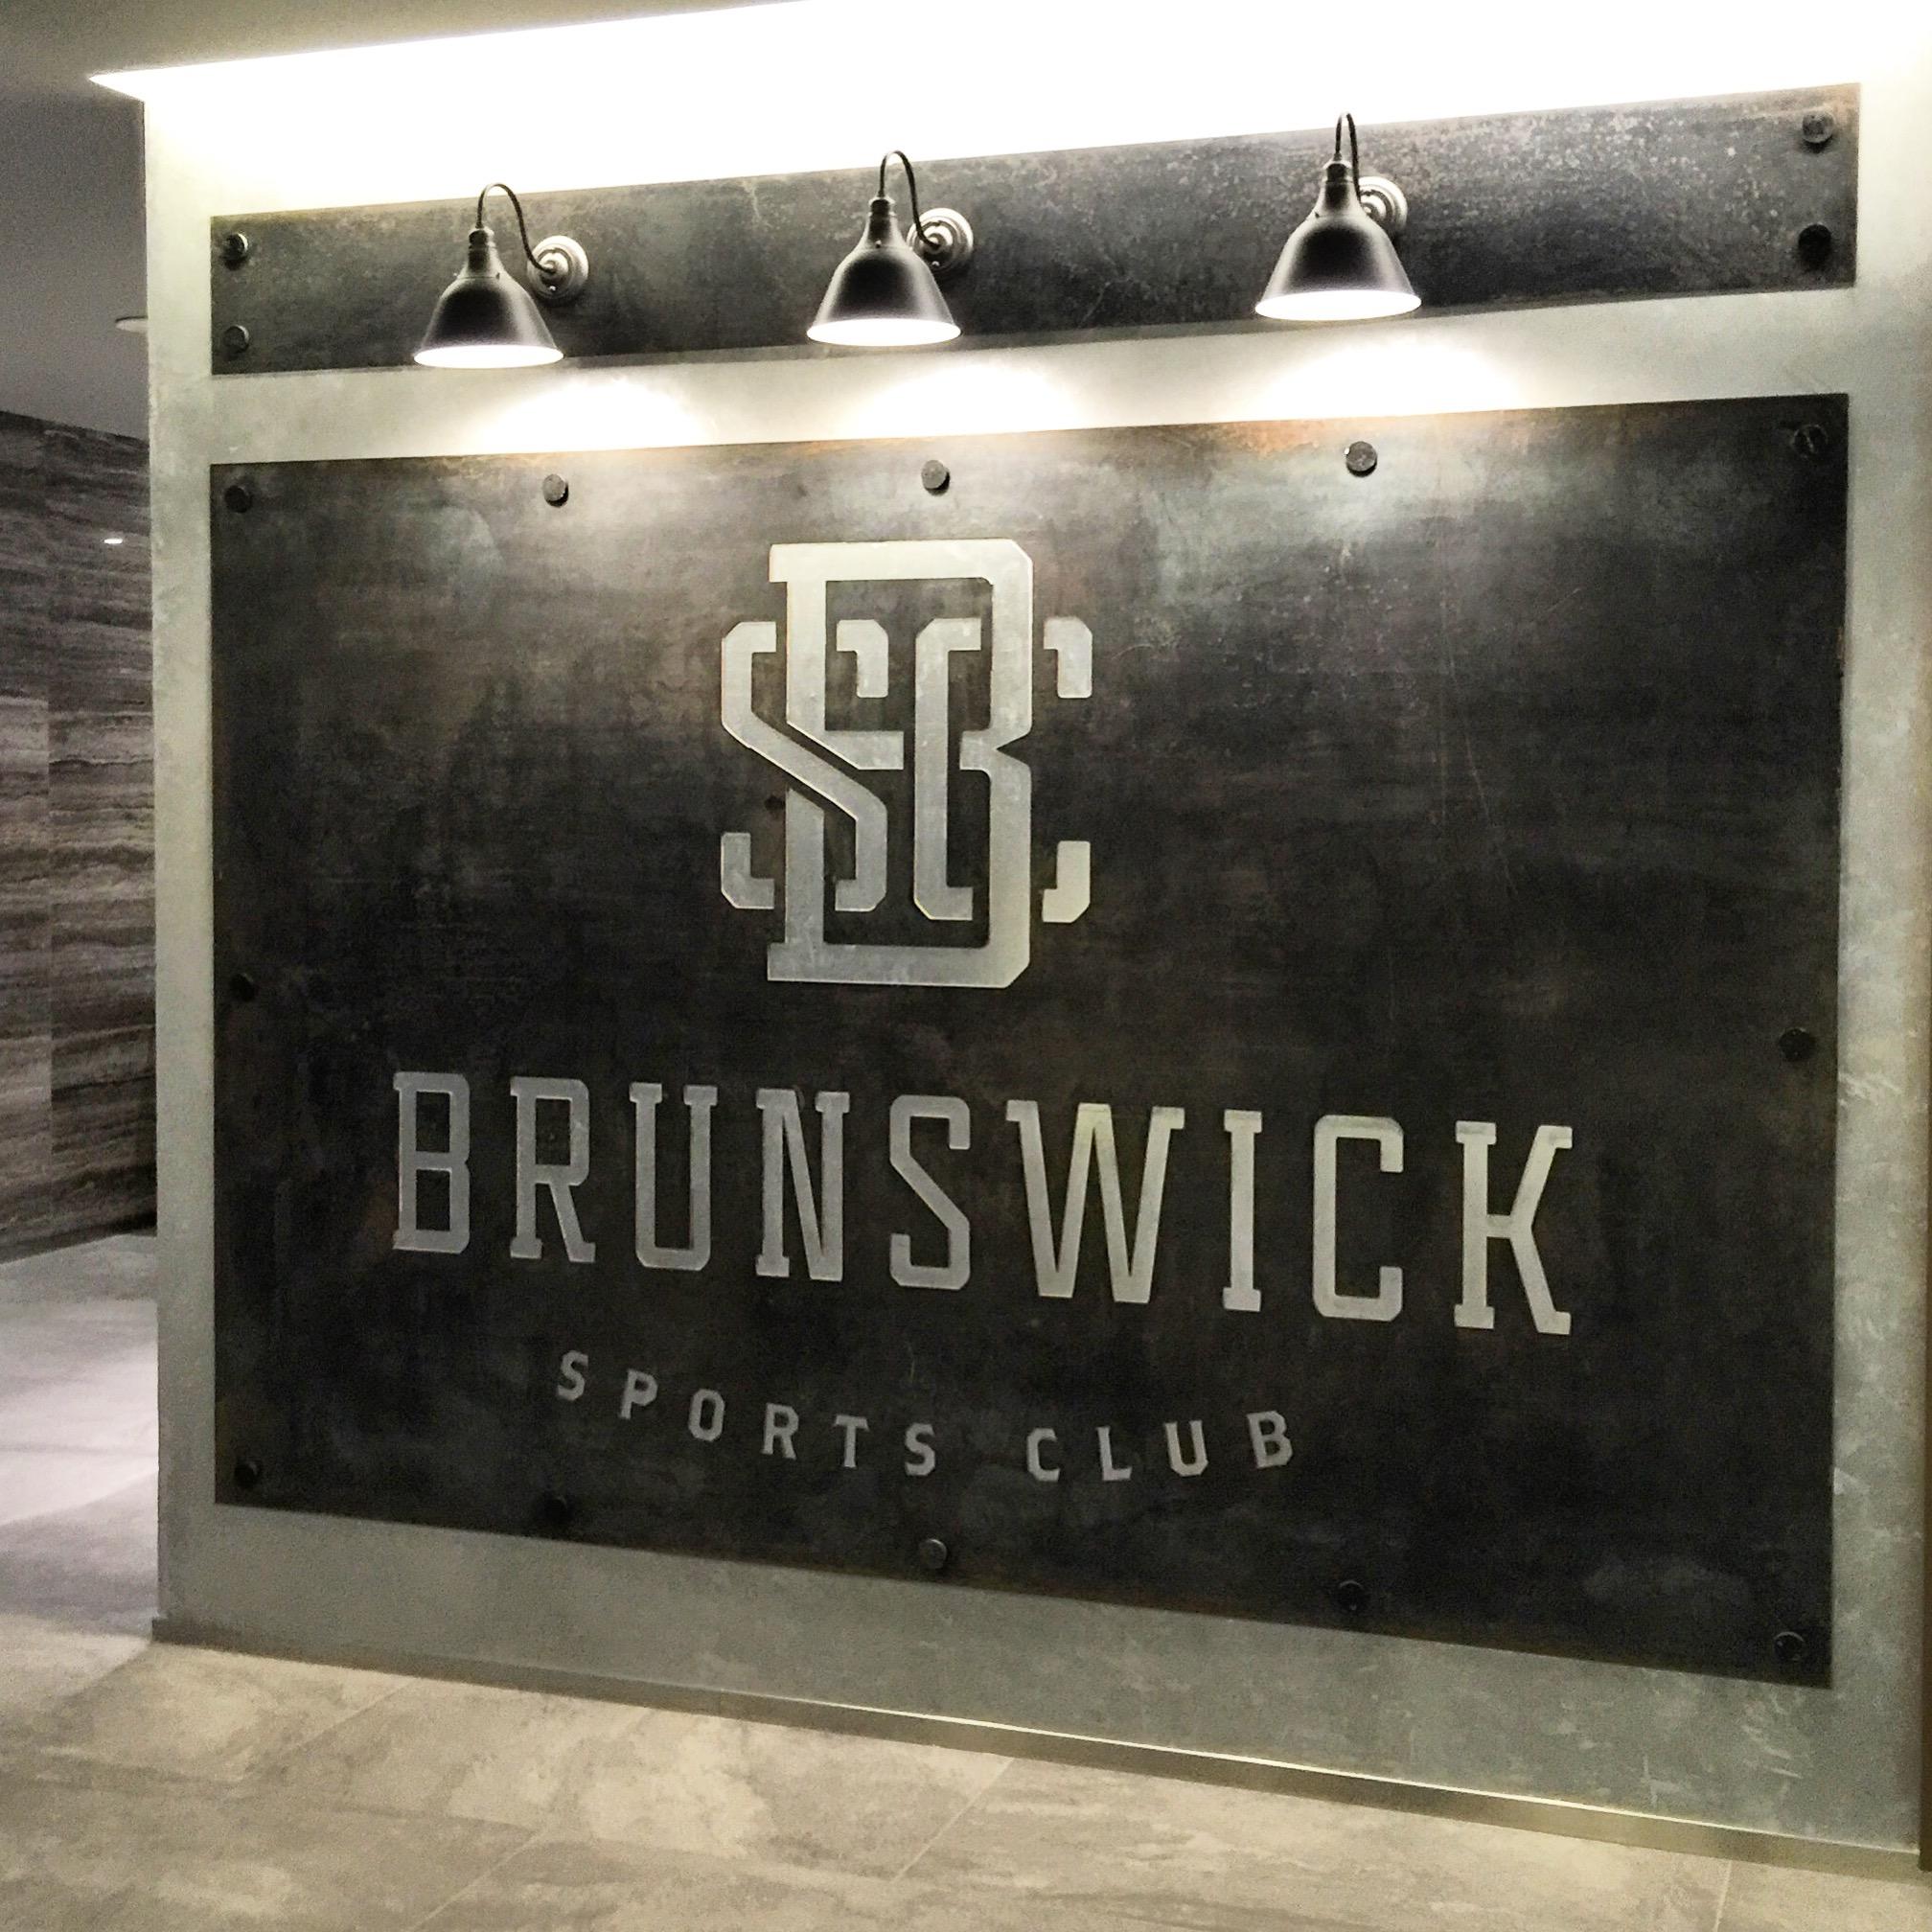 The Brunswick Sports Club